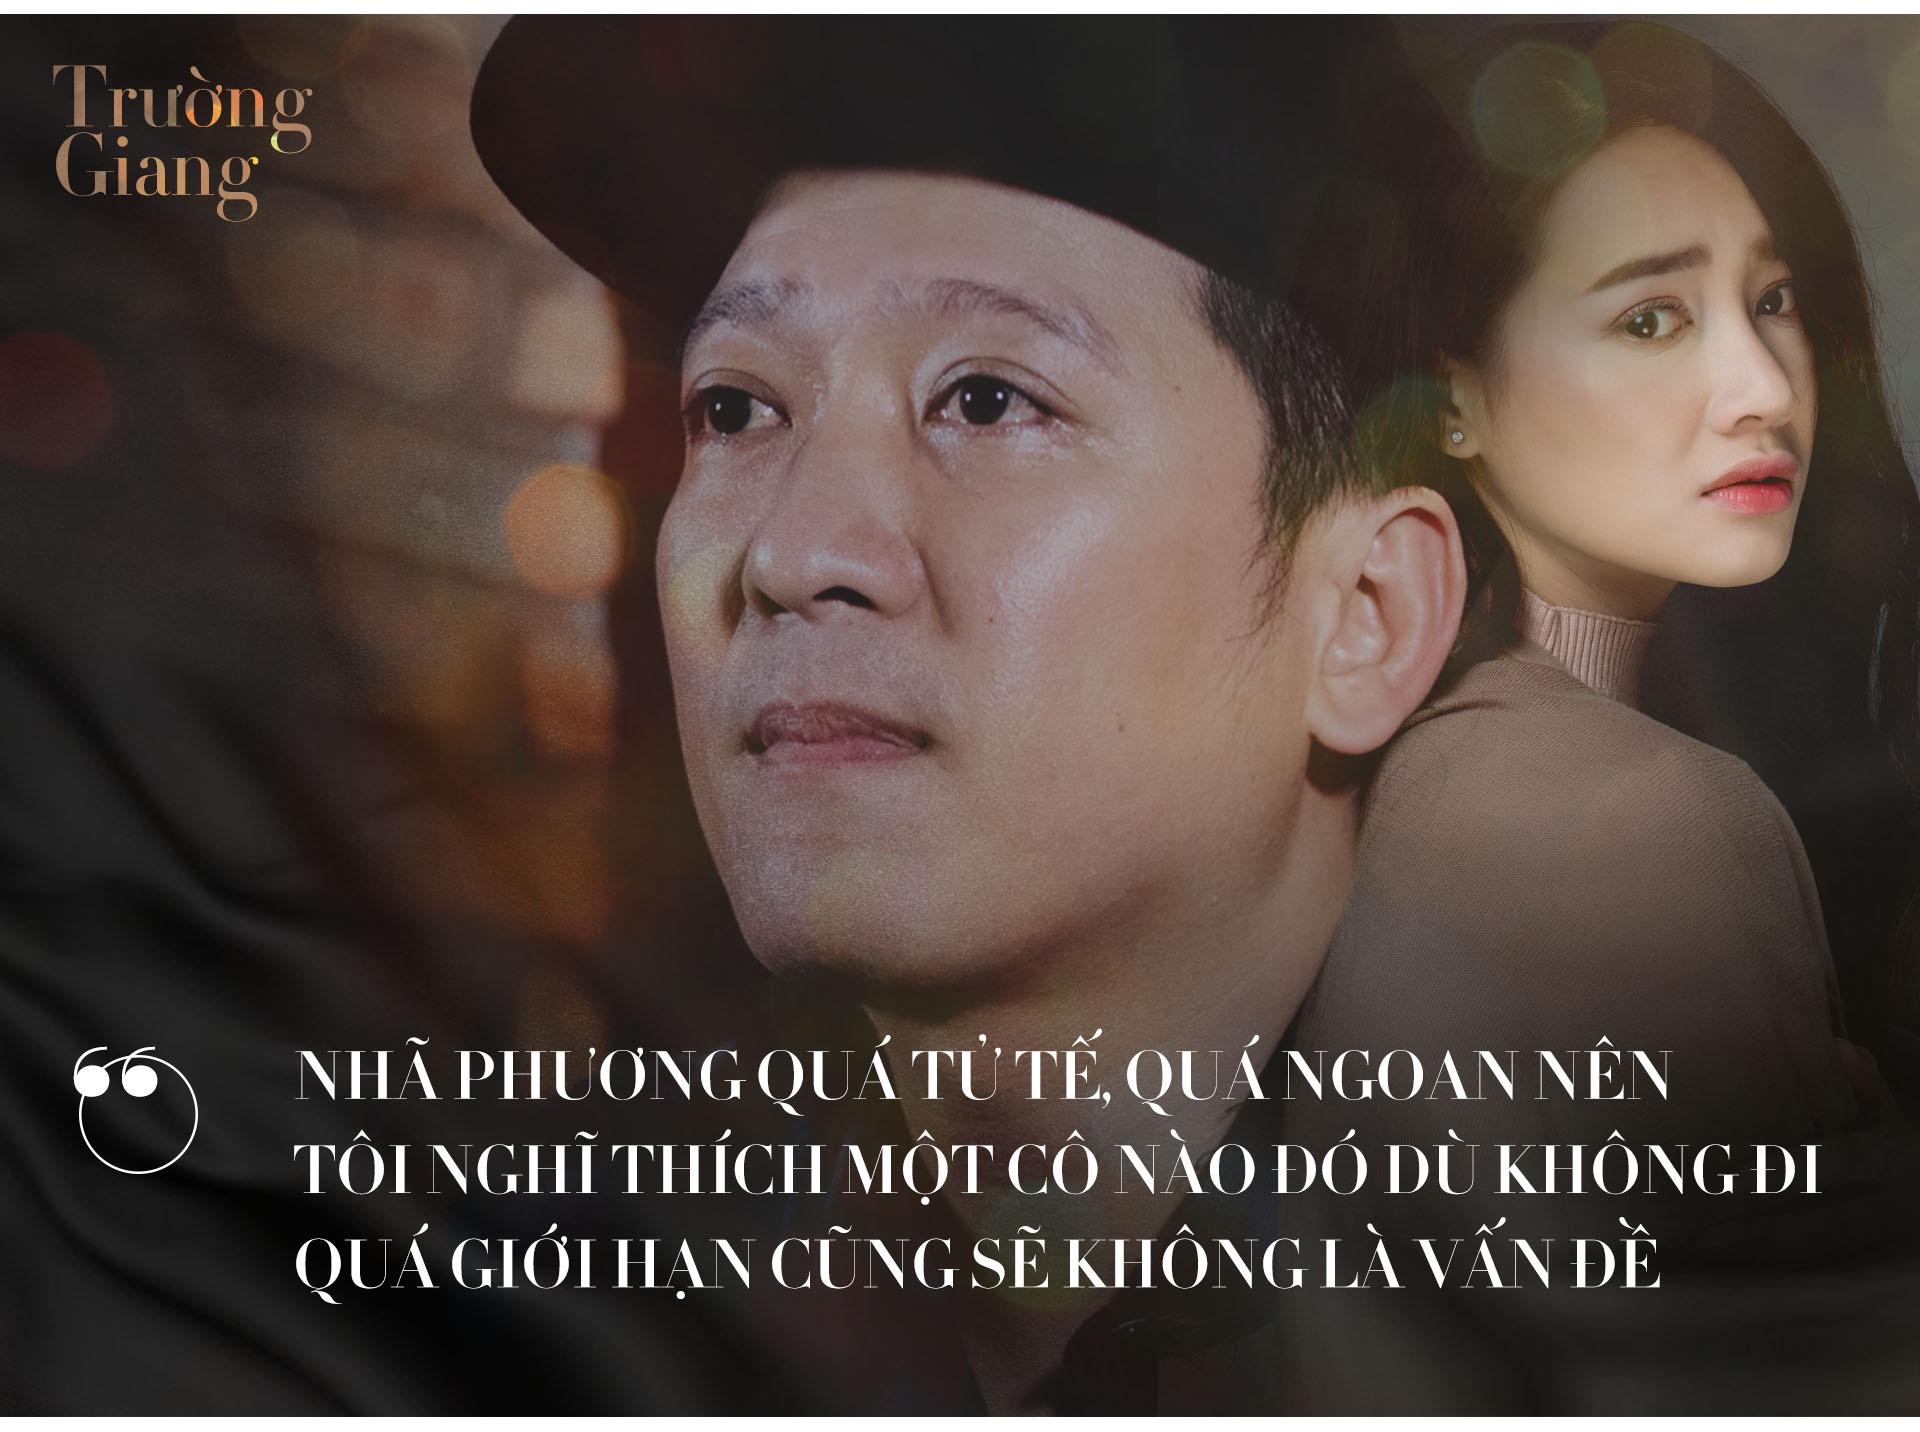 Truong Giang: 'Khong dam mong su tha thu cua Nha Phuong sau loi lam' hinh anh 9